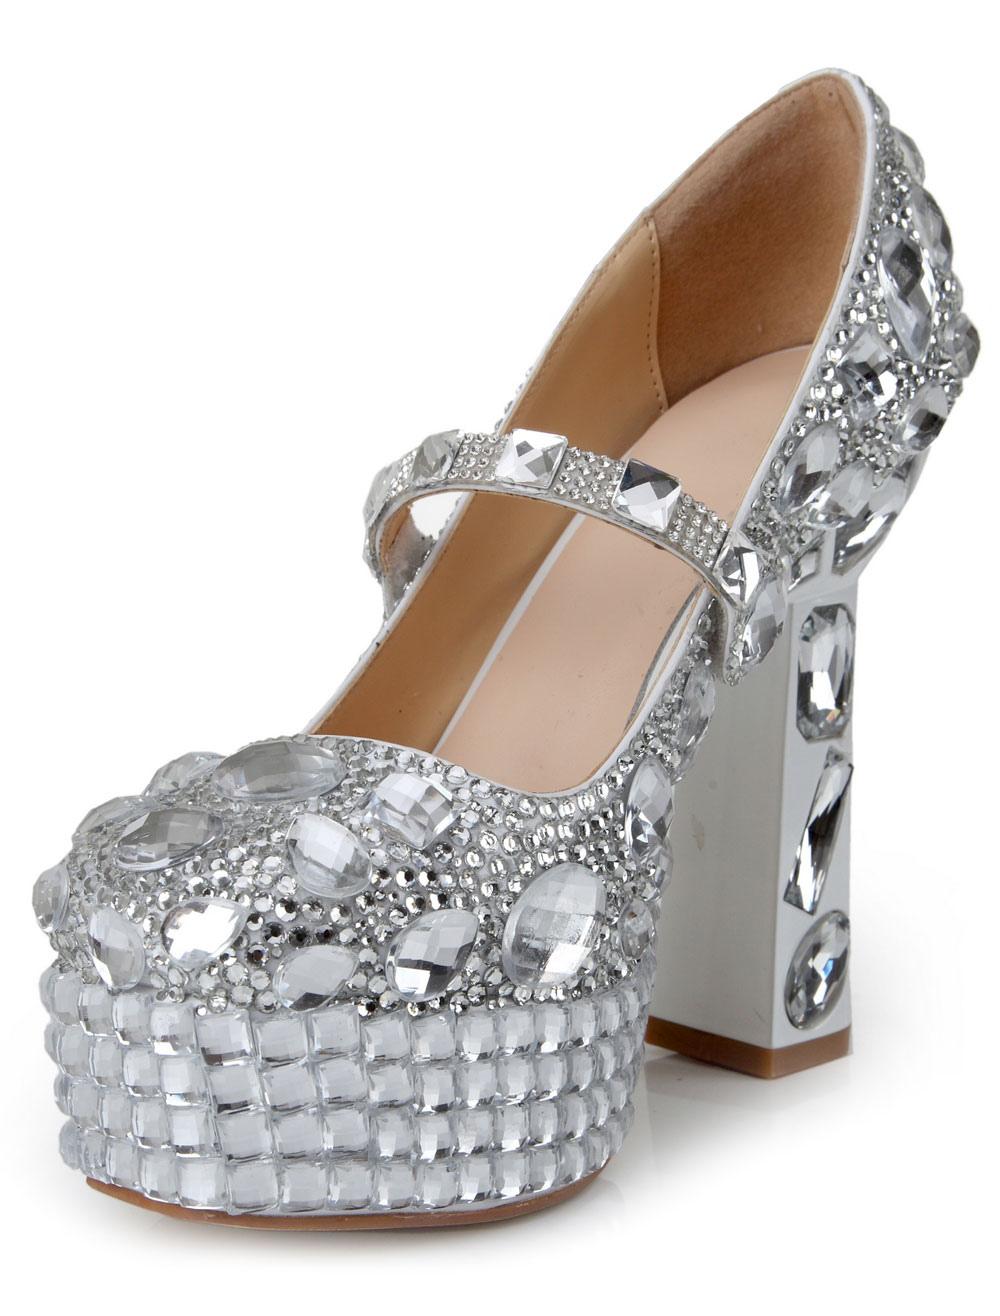 8e841a7e4bc Attractive Silver Patent PU Round Toe Chunky High Heels For Women -  Milanoo.com